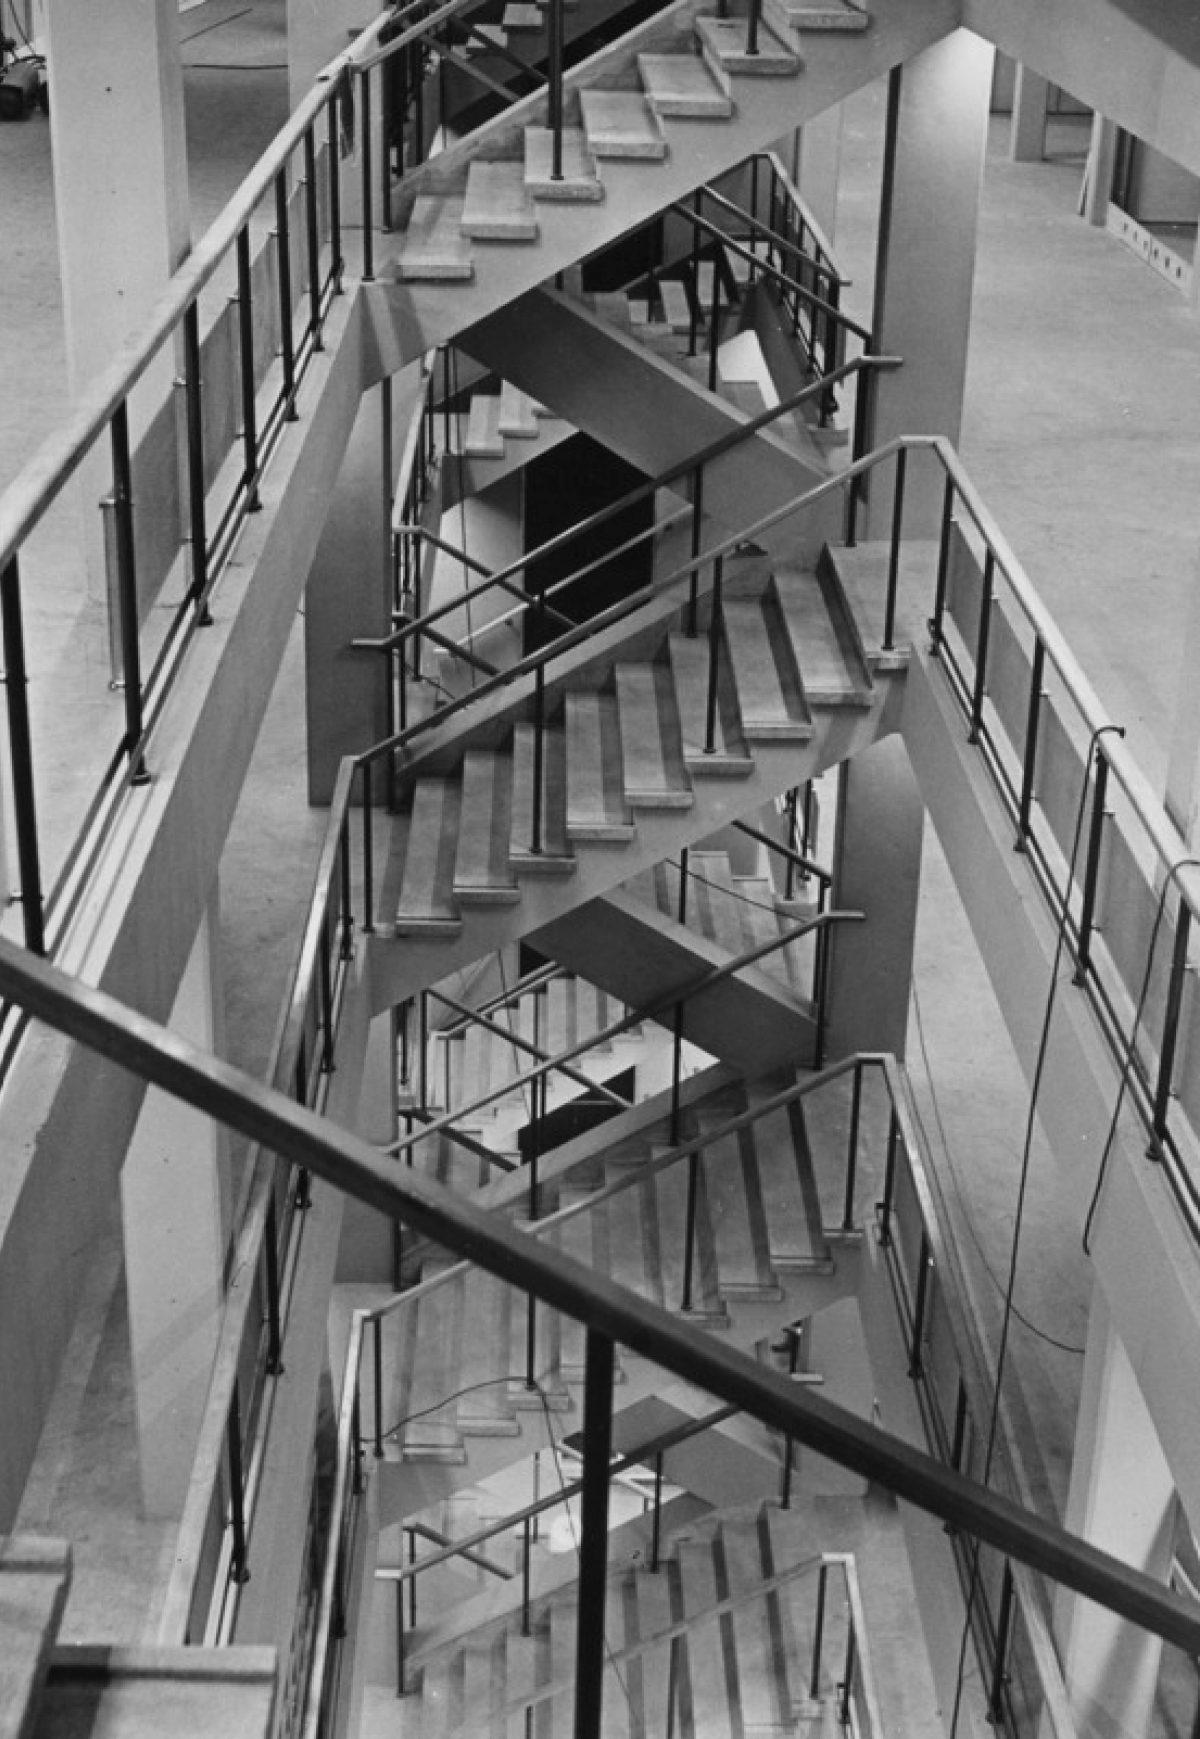 1956 Twaalf Prov HVV NL Rt SA 4100 2005 74 1 TM 2 01